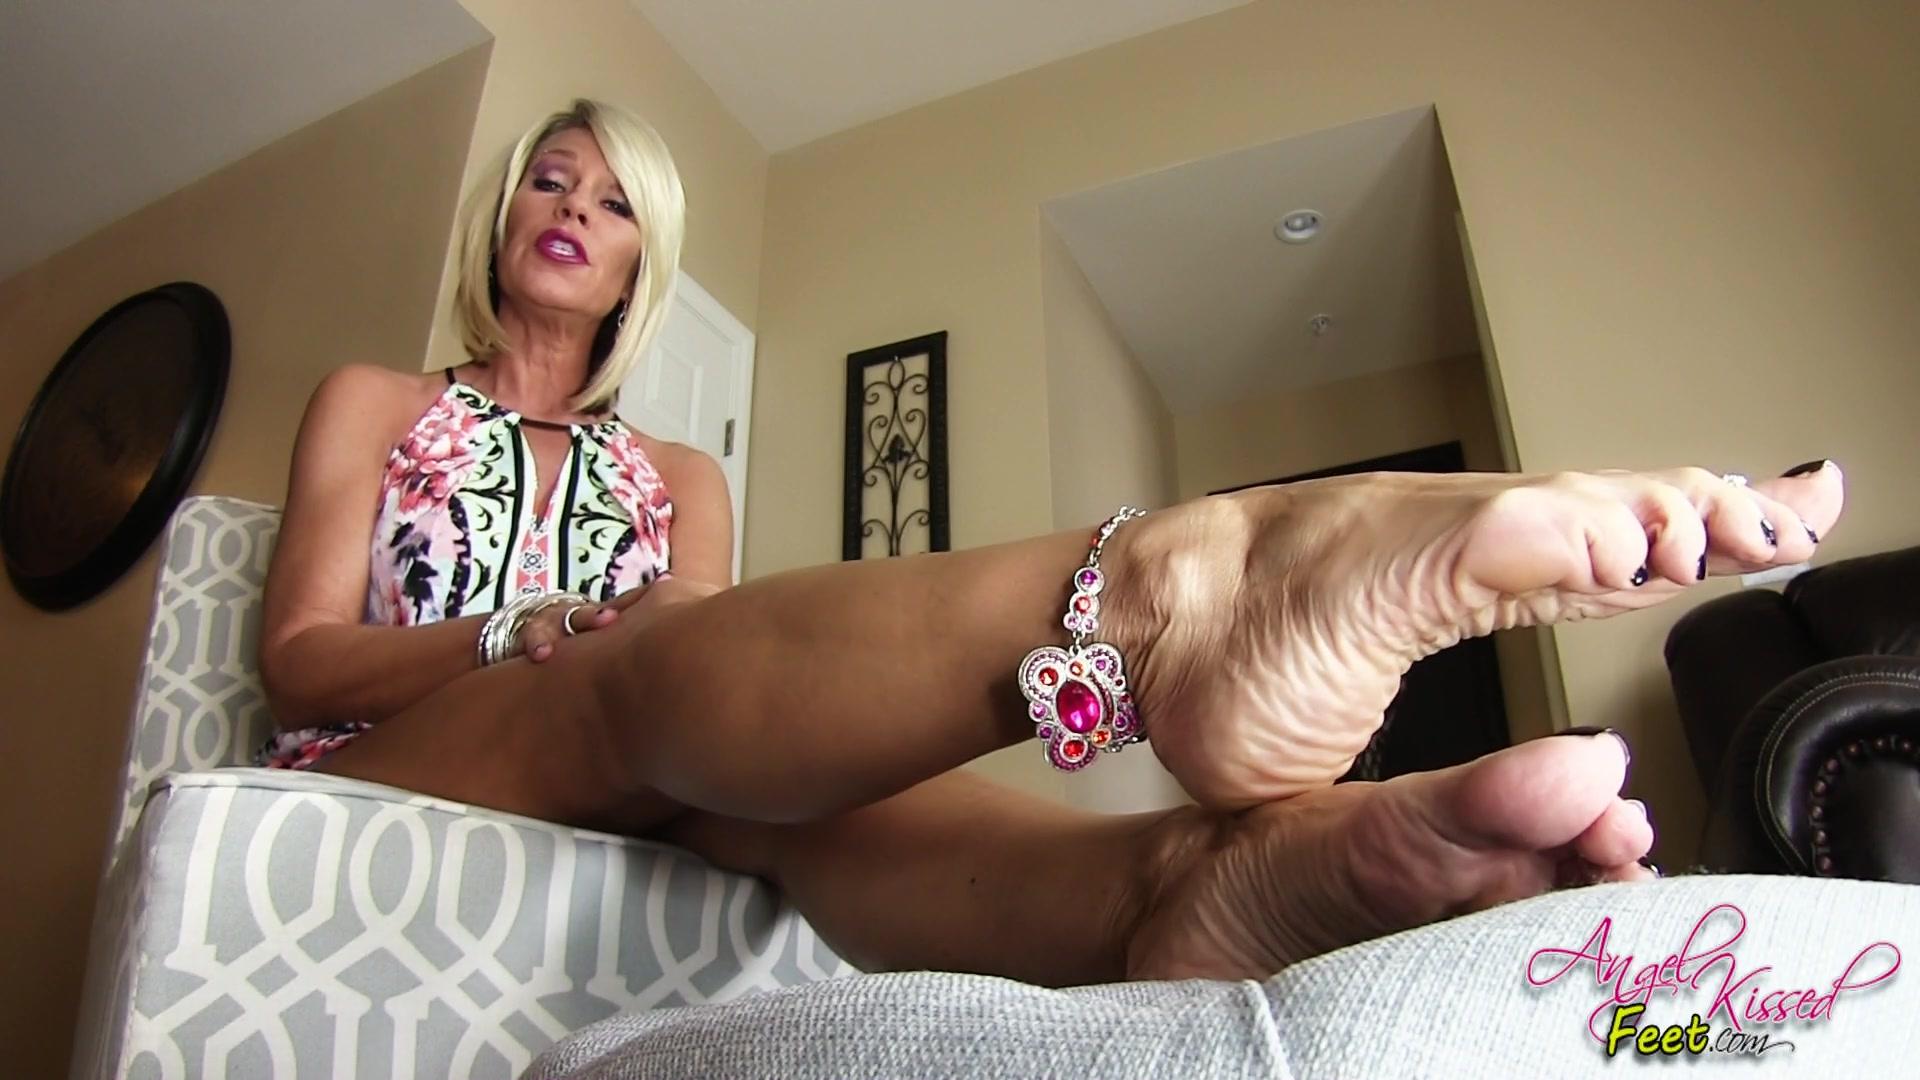 Milf feet tease Angelkissedfeet Milf Feet Teasing Stroke Session